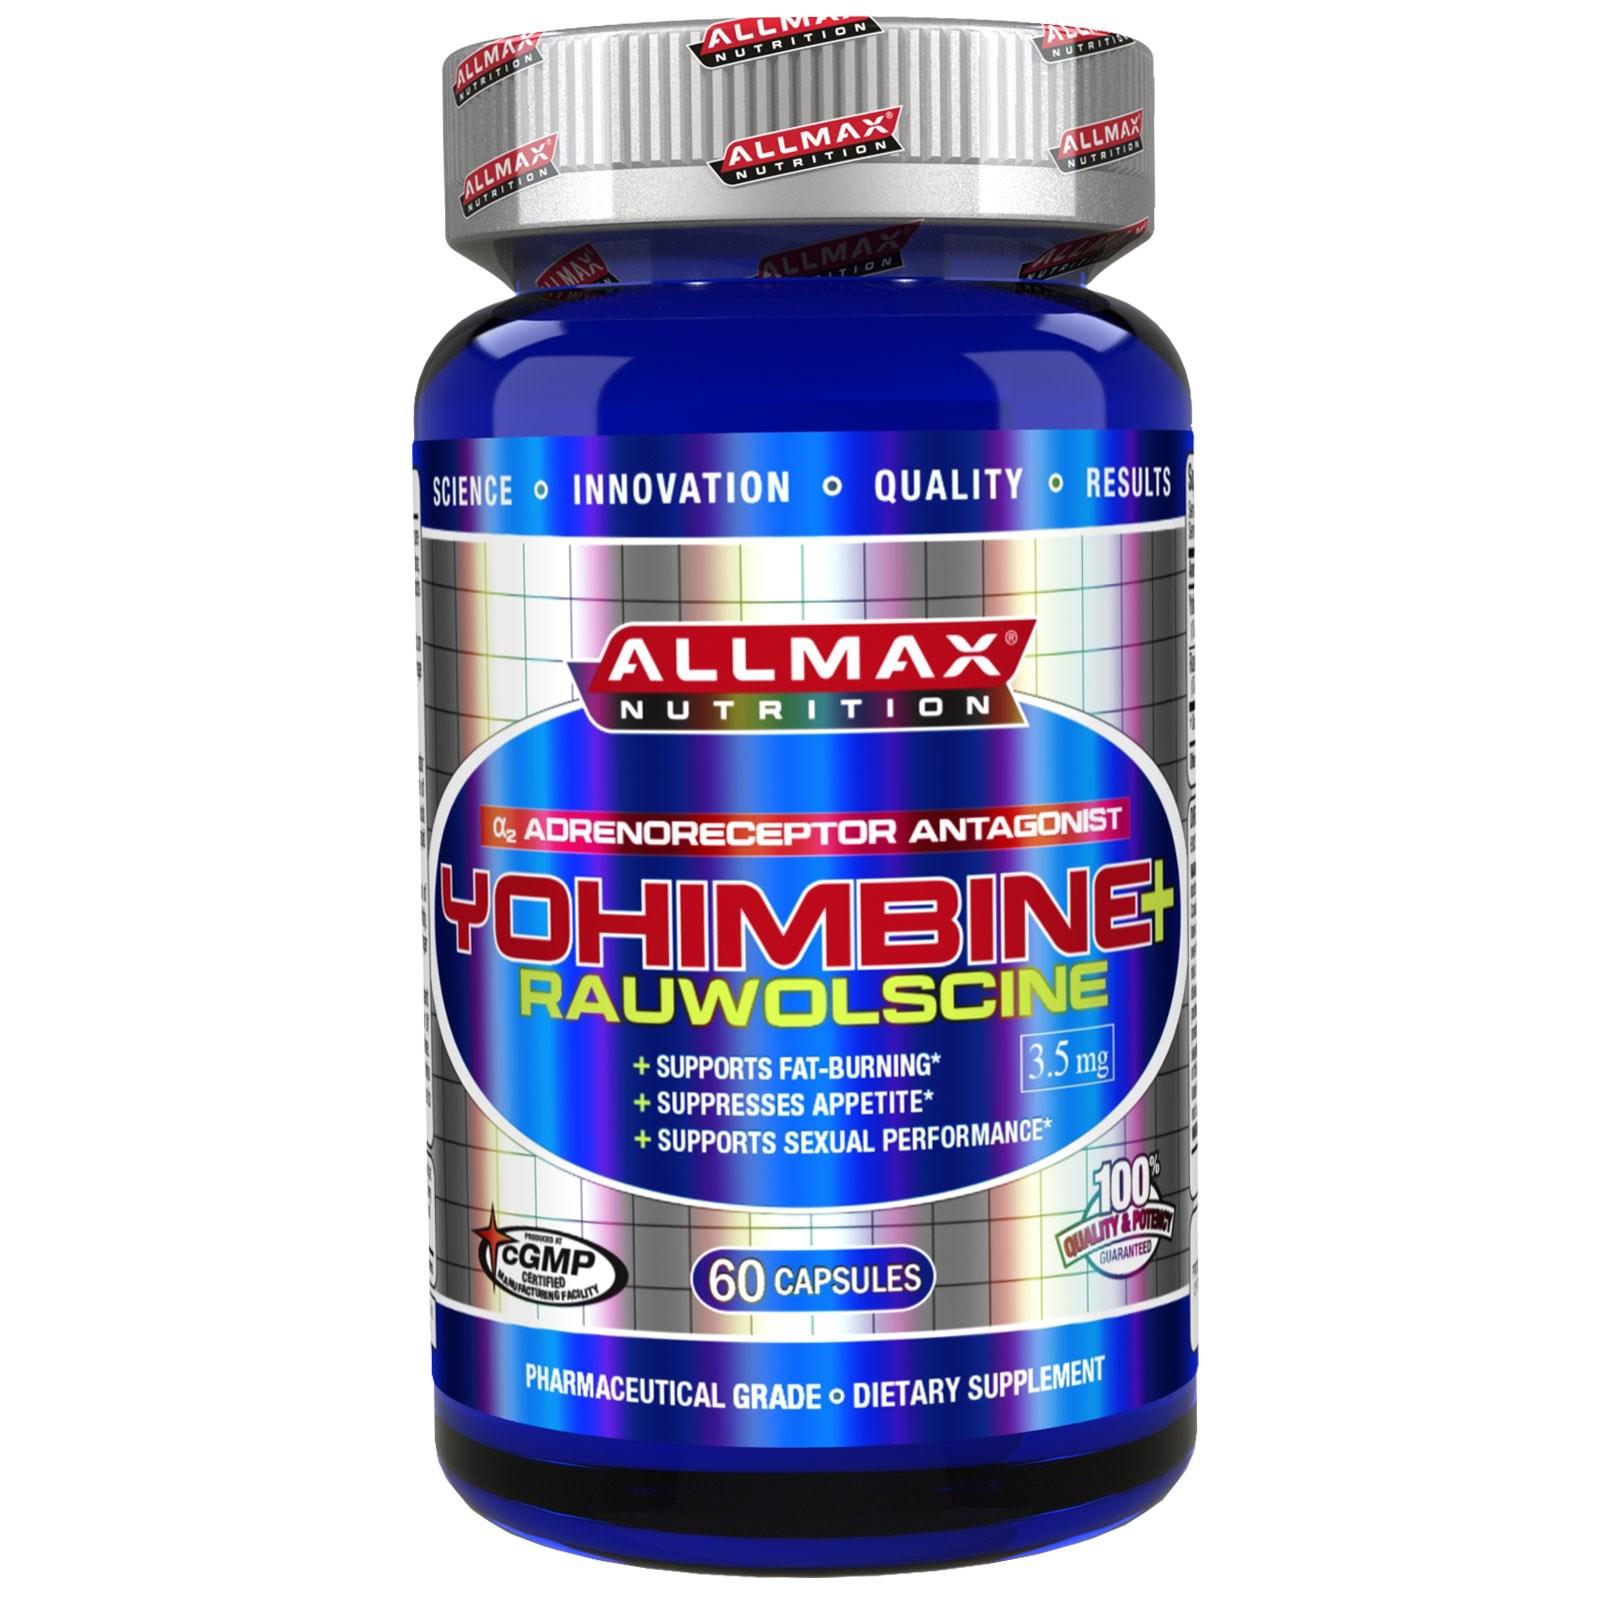 ALLMAX Nutrition, Yohimbine HCl (Max Strength Yohimbe), 3.5 mg, 60 Veggie Capsules